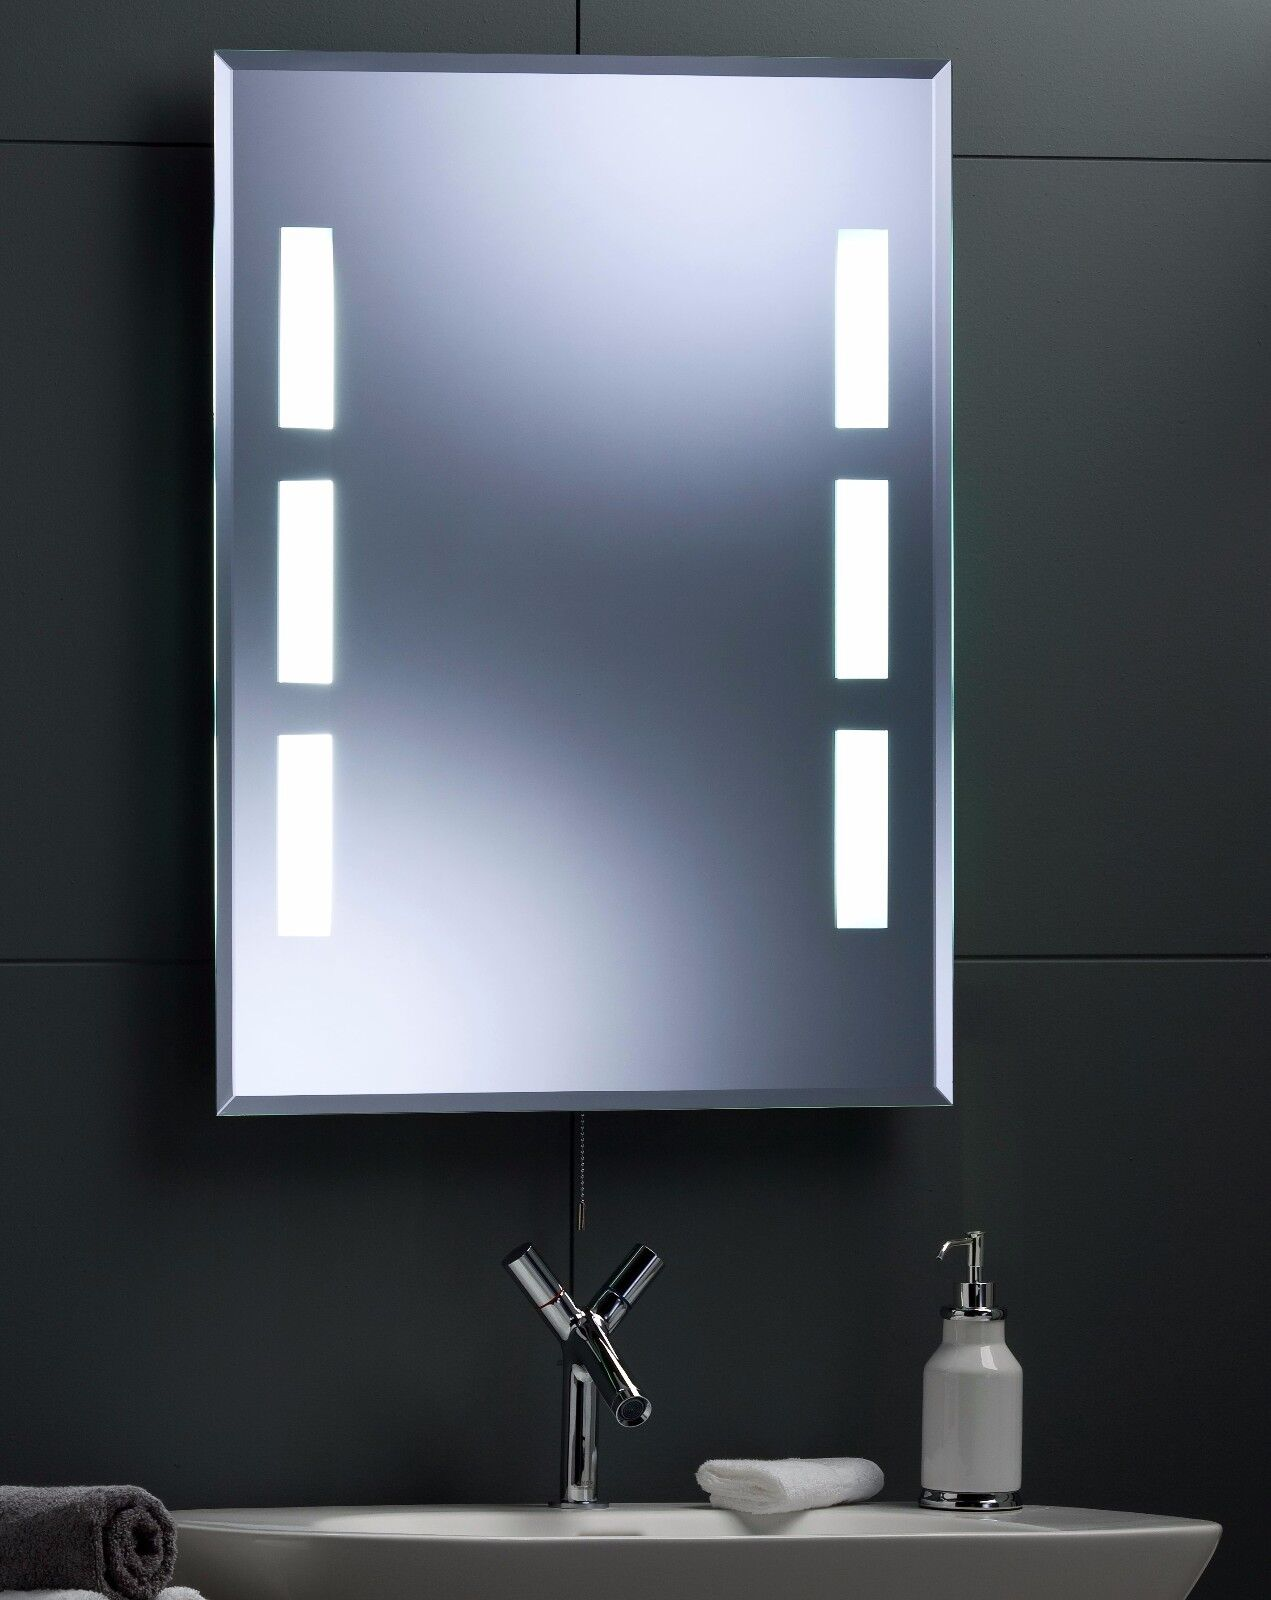 Bathroom Mirrors Illuminated: Illuminated Bathroom Wall Mirror With Long Life LED